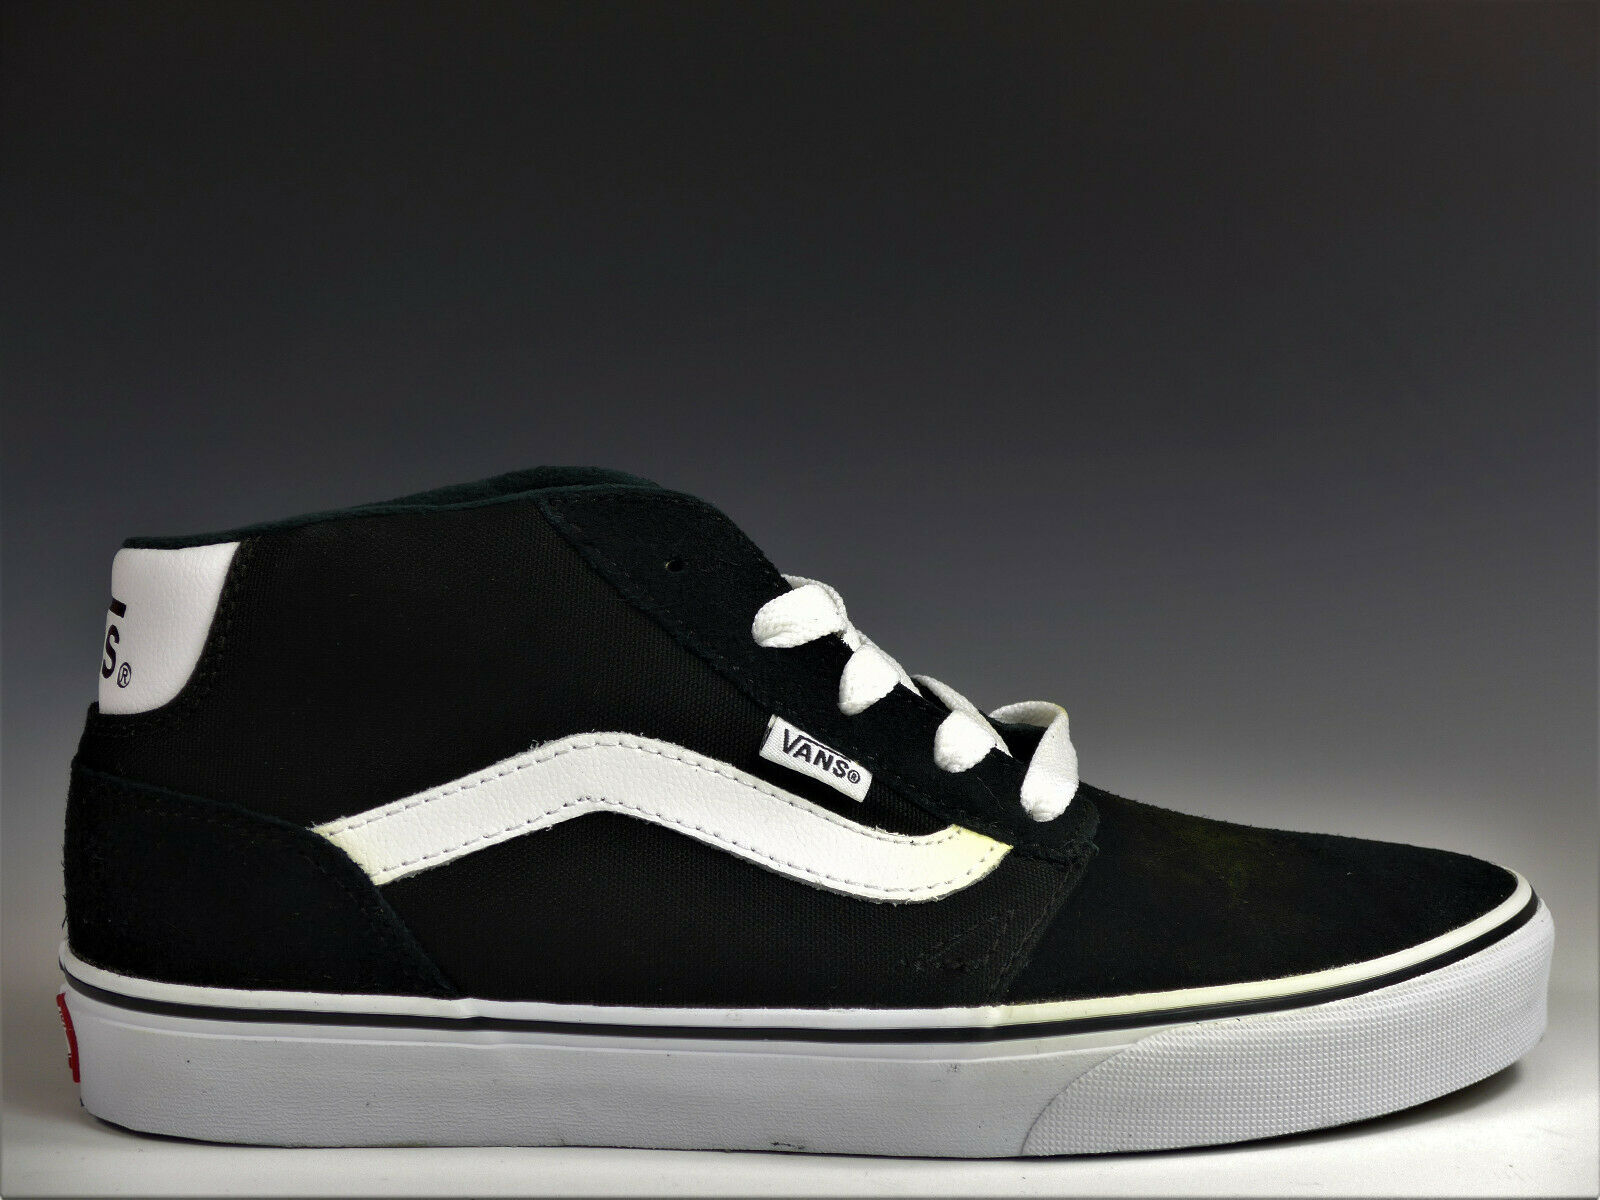 Vans Champan Mid Suede Canvas Sneaker Schuhe Skaterschuhe (Black/white) B-Ware